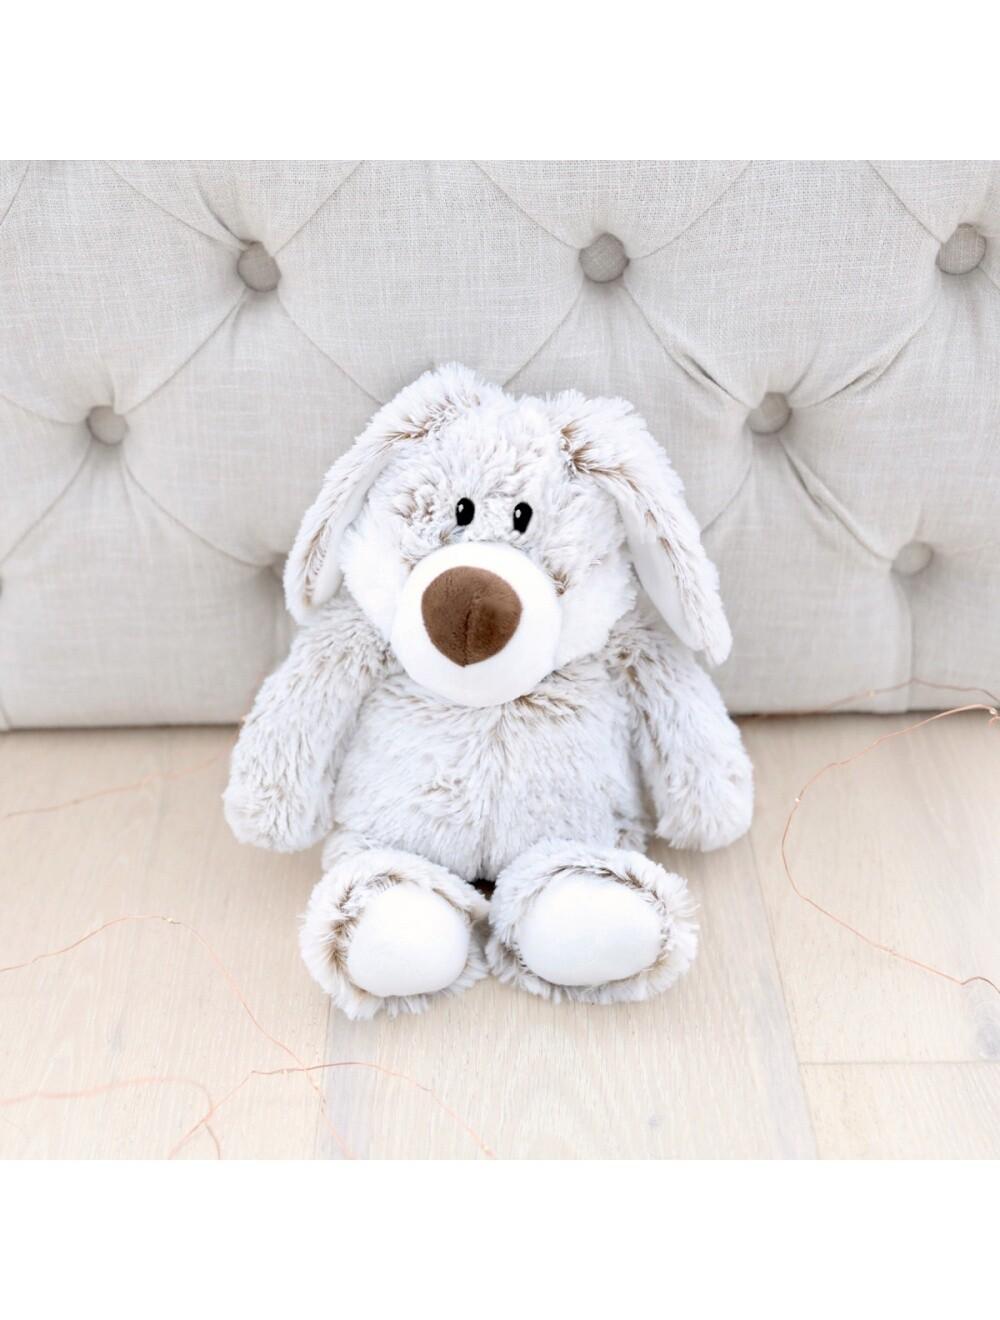 Warmies - Marshmallow Bunny